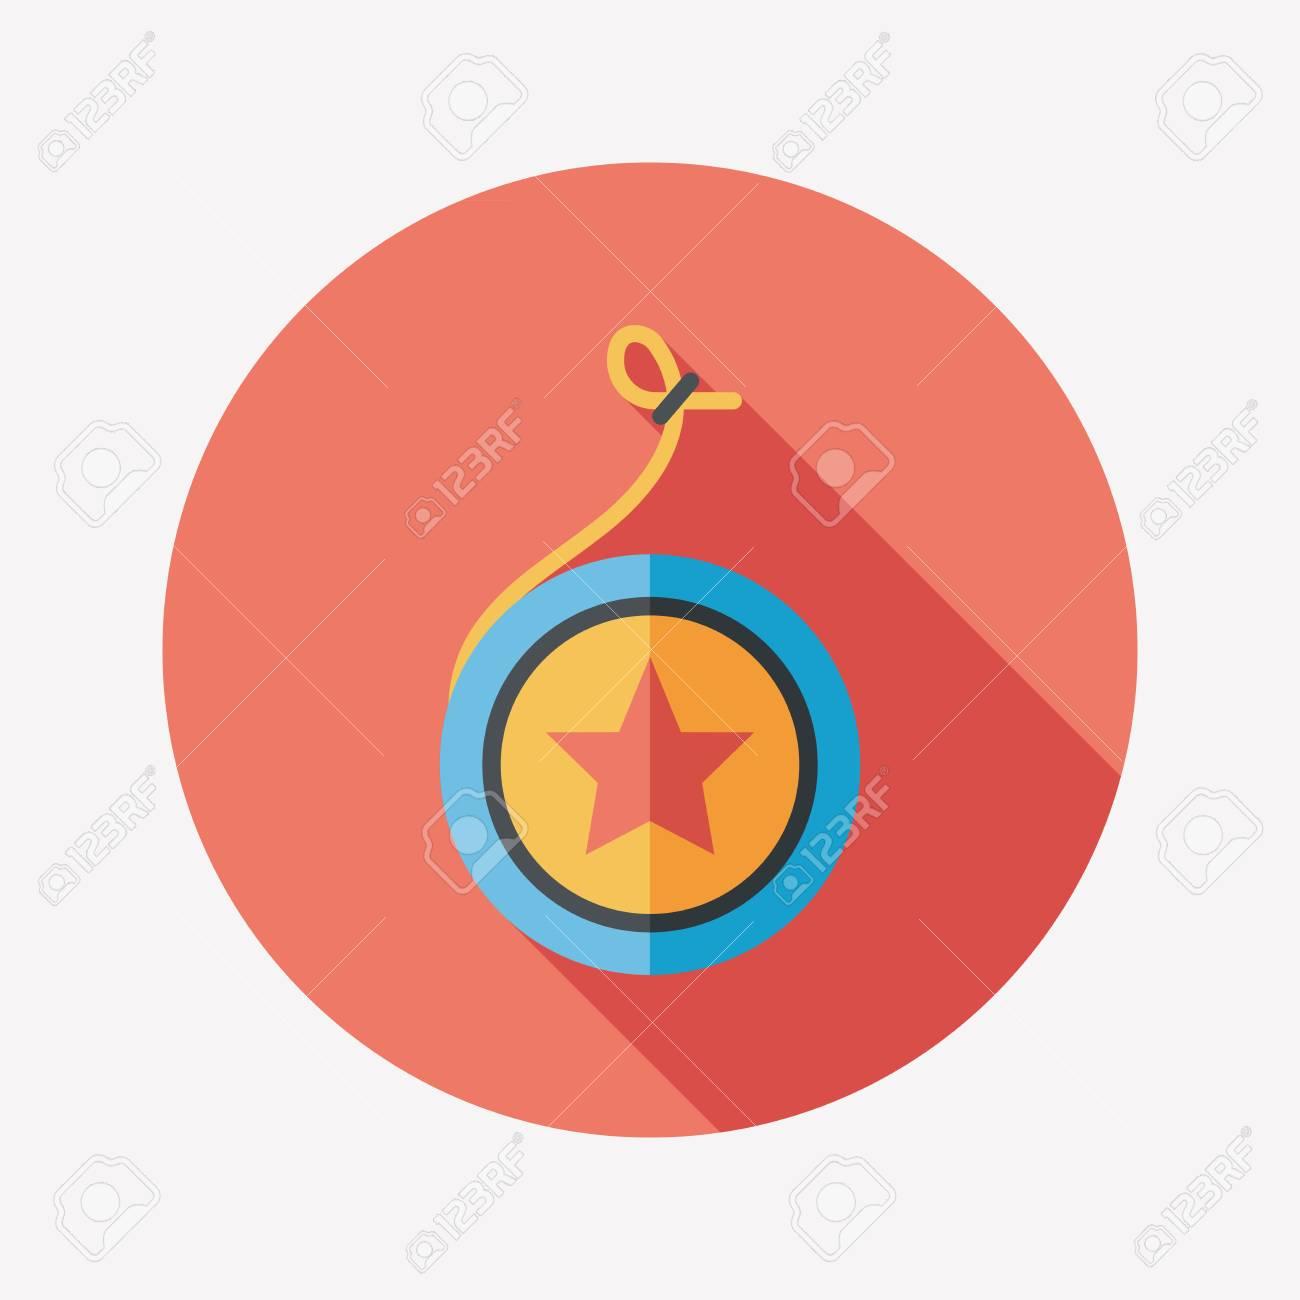 Yo yo flat icon with long shadoweps 10 royalty free cliparts yo yo flat icon with long shadoweps 10 stock vector 31112605 buycottarizona Images